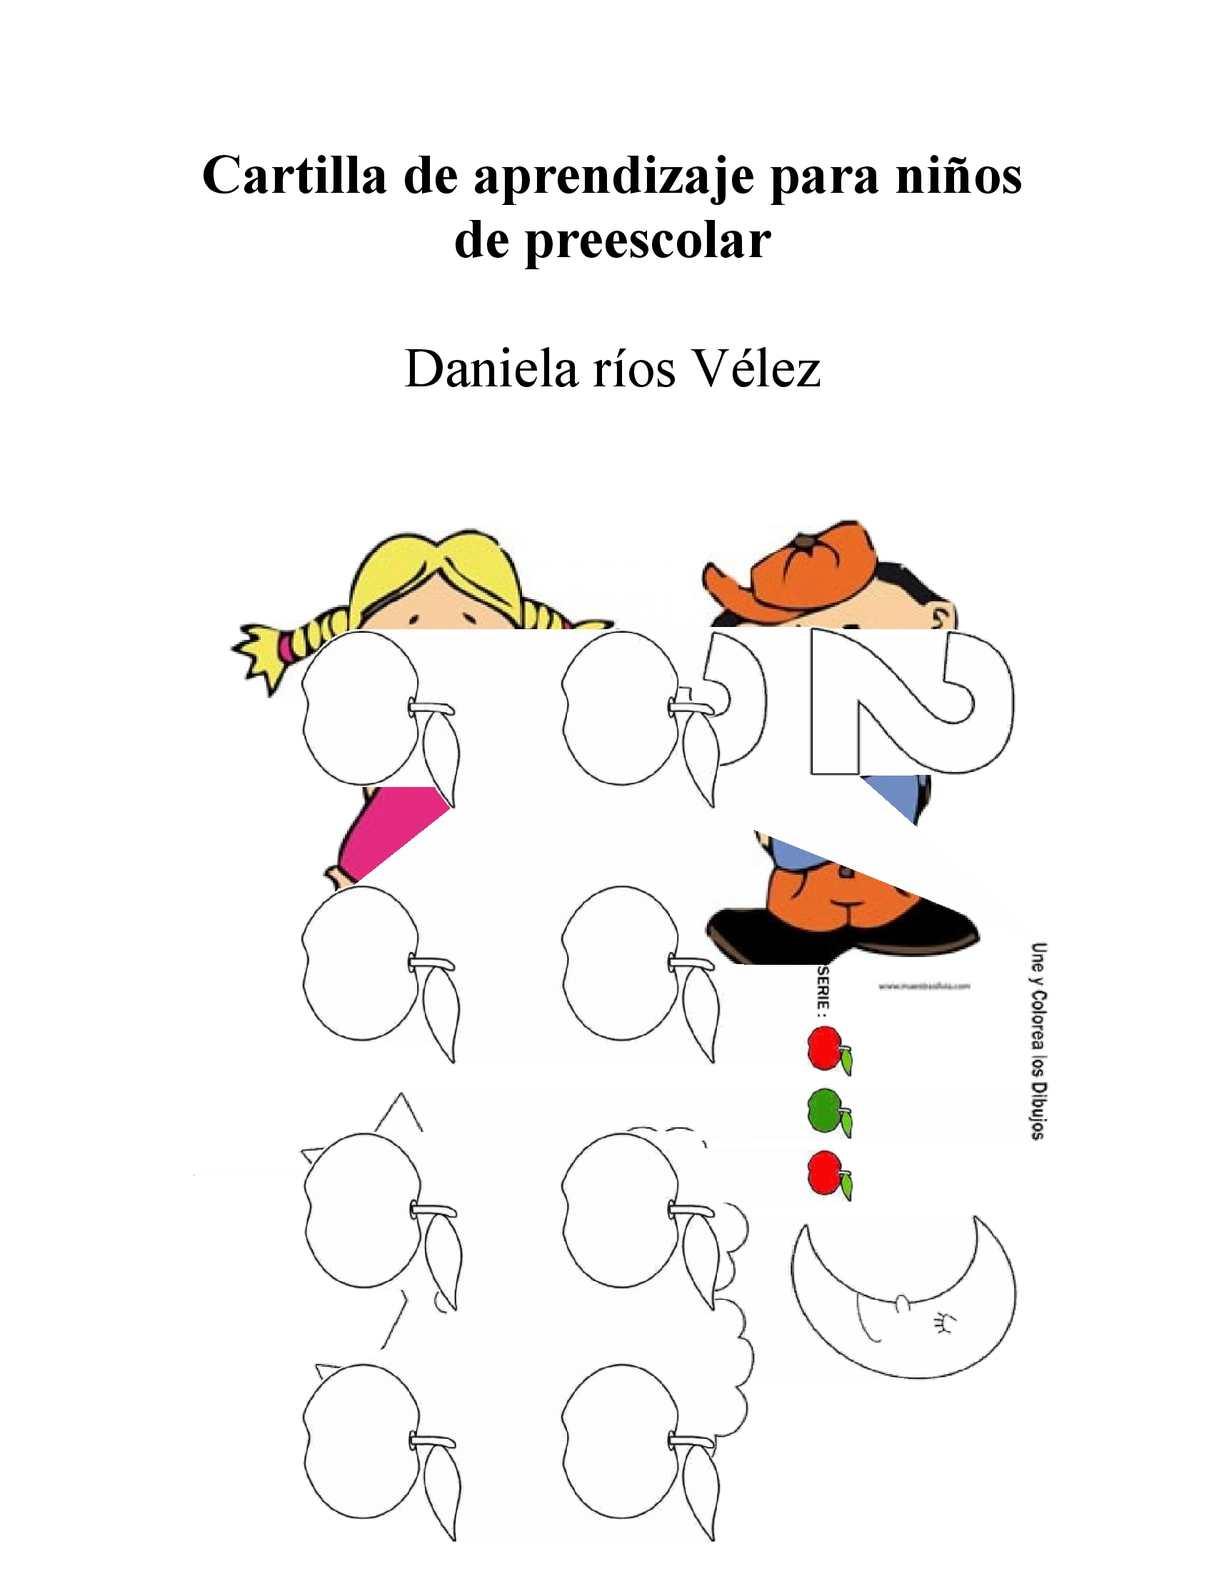 Cartilla De Aprendizaje Para Niños De Preescolar